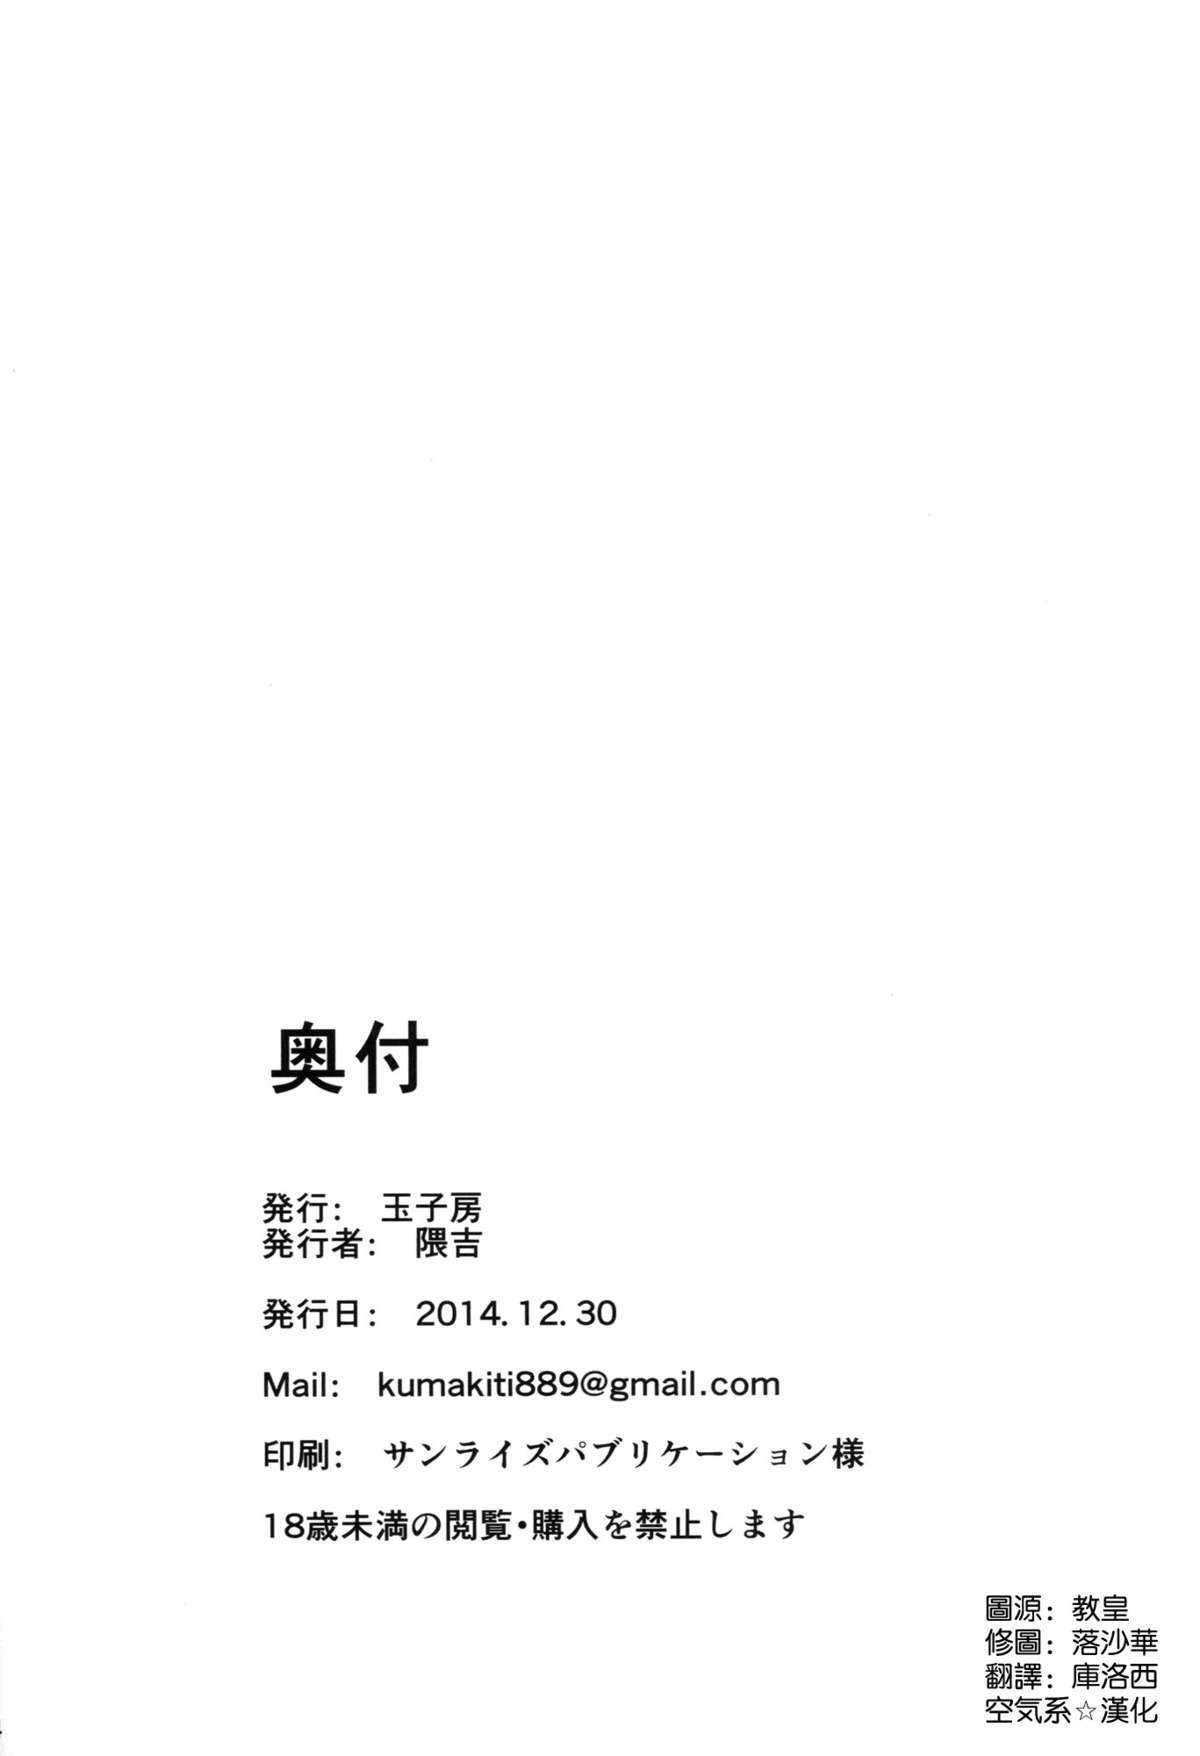 Fuso Kekkon-Seikatu 25